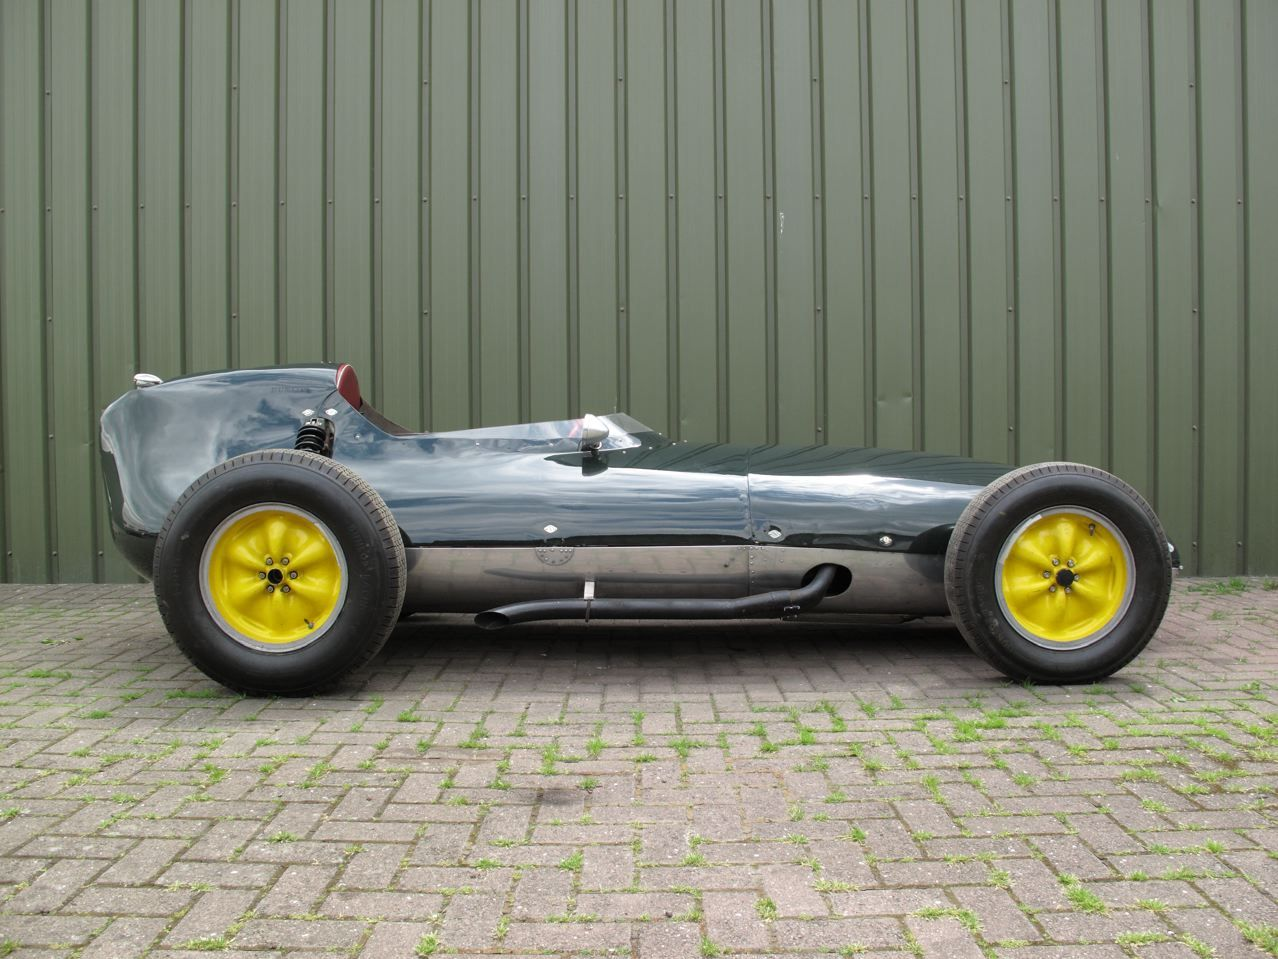 Lotus 49 | Lotus cars | Pinterest | Lotus, Ford and Engine